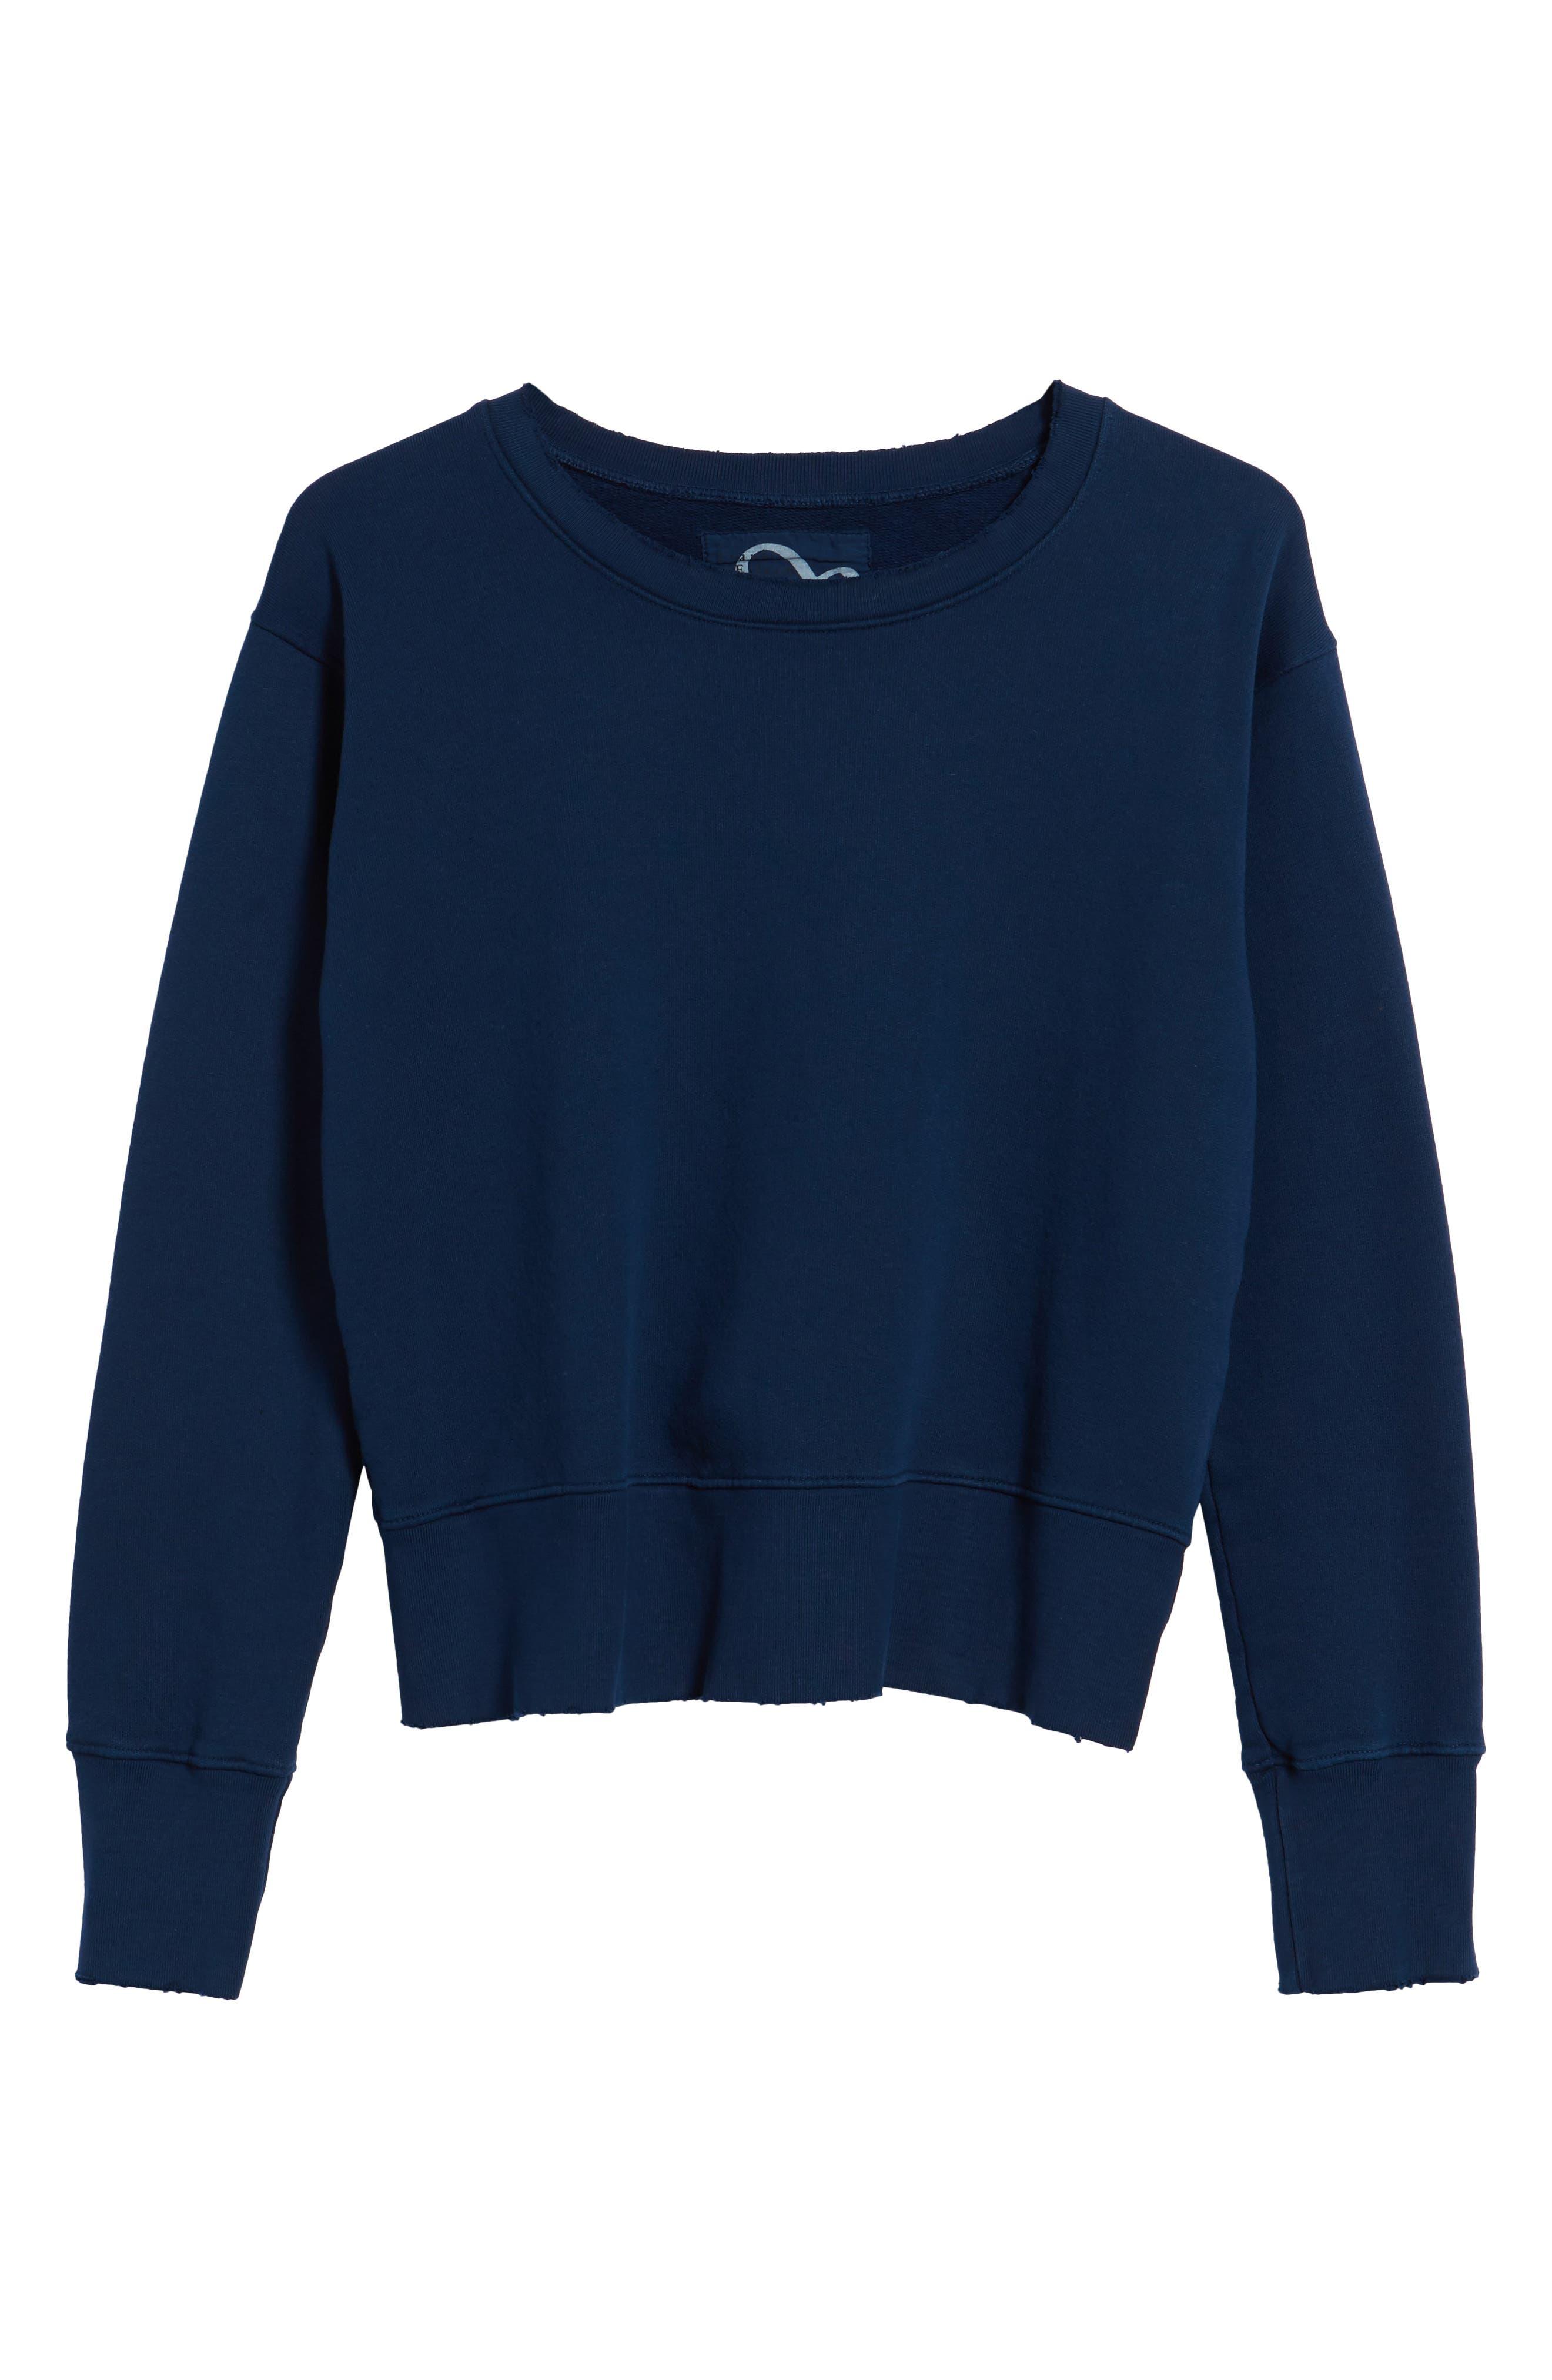 Distressed Sweatshirt,                             Alternate thumbnail 6, color,                             Blazer